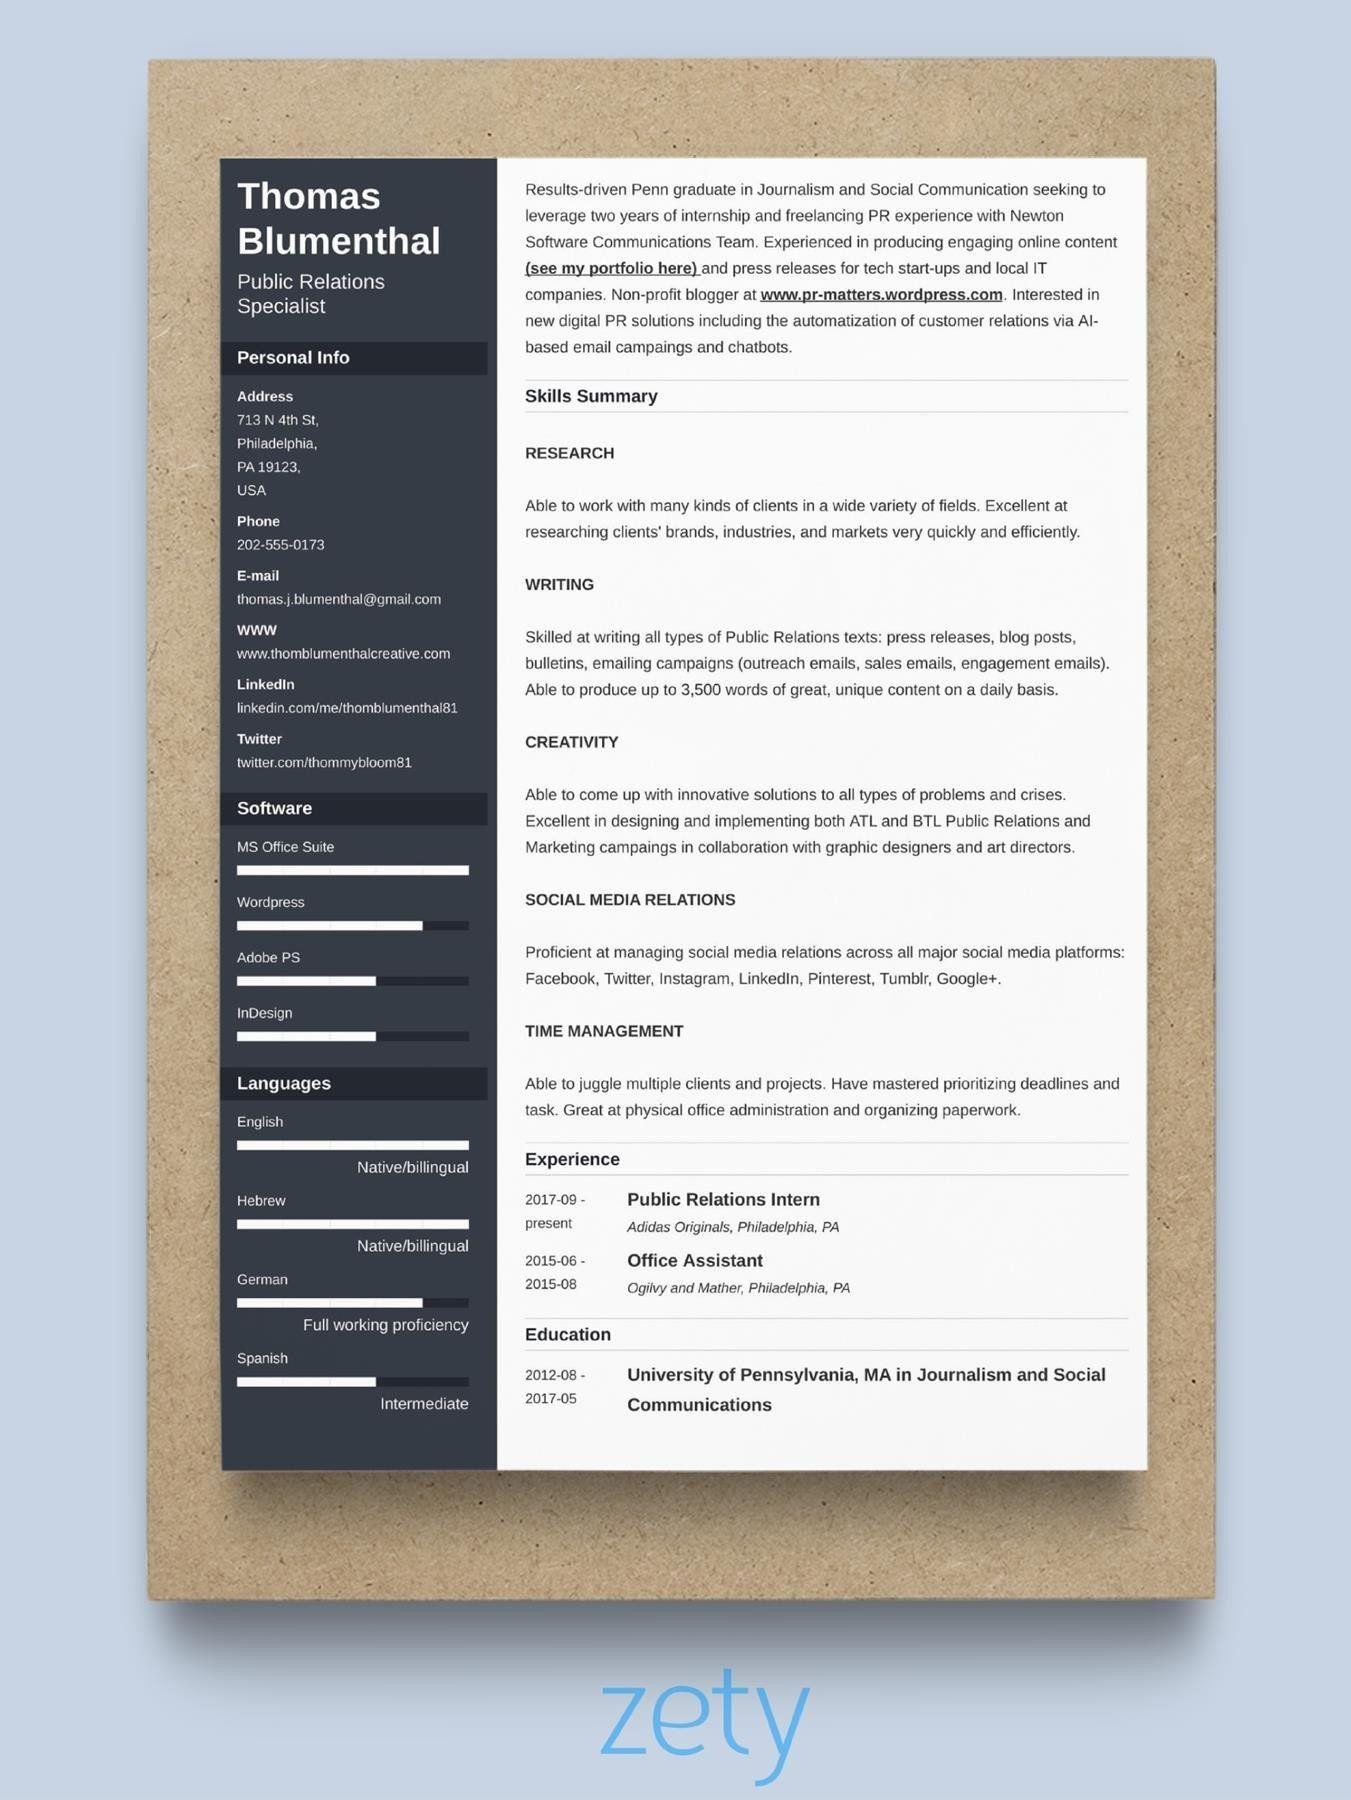 Best Resume Format 2021 3 Professional Samples In 2021 Best Resume Format Resume Format Job Resume Format